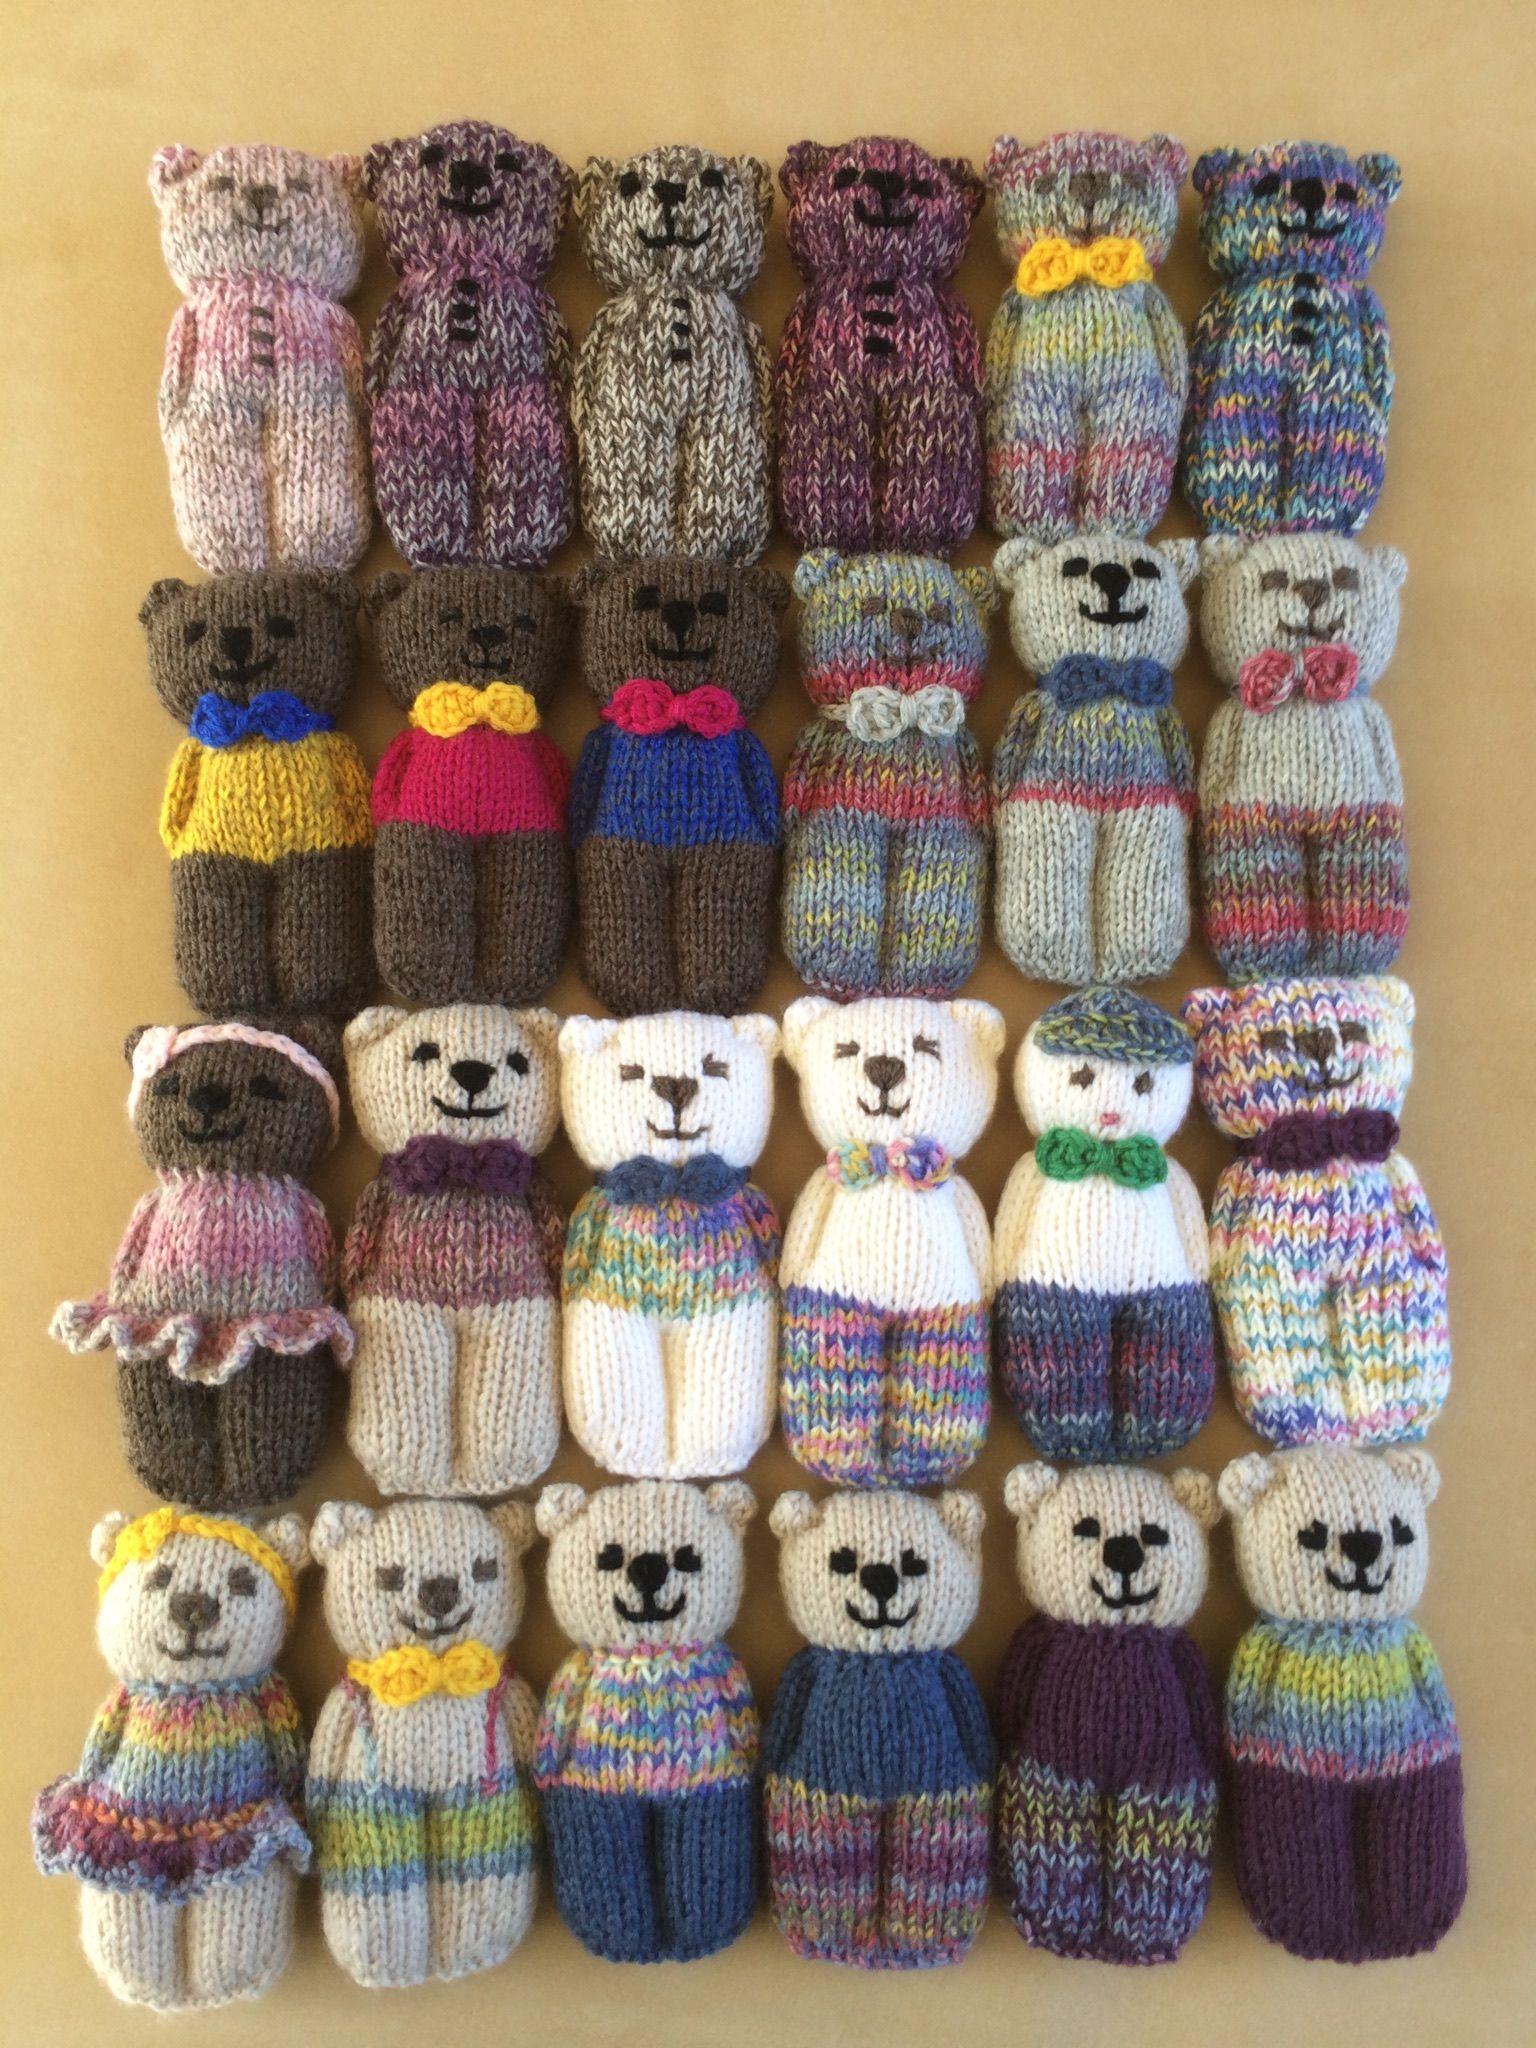 Comfort Dolls Knit Projects Knitting Crochet Knitting Patterns